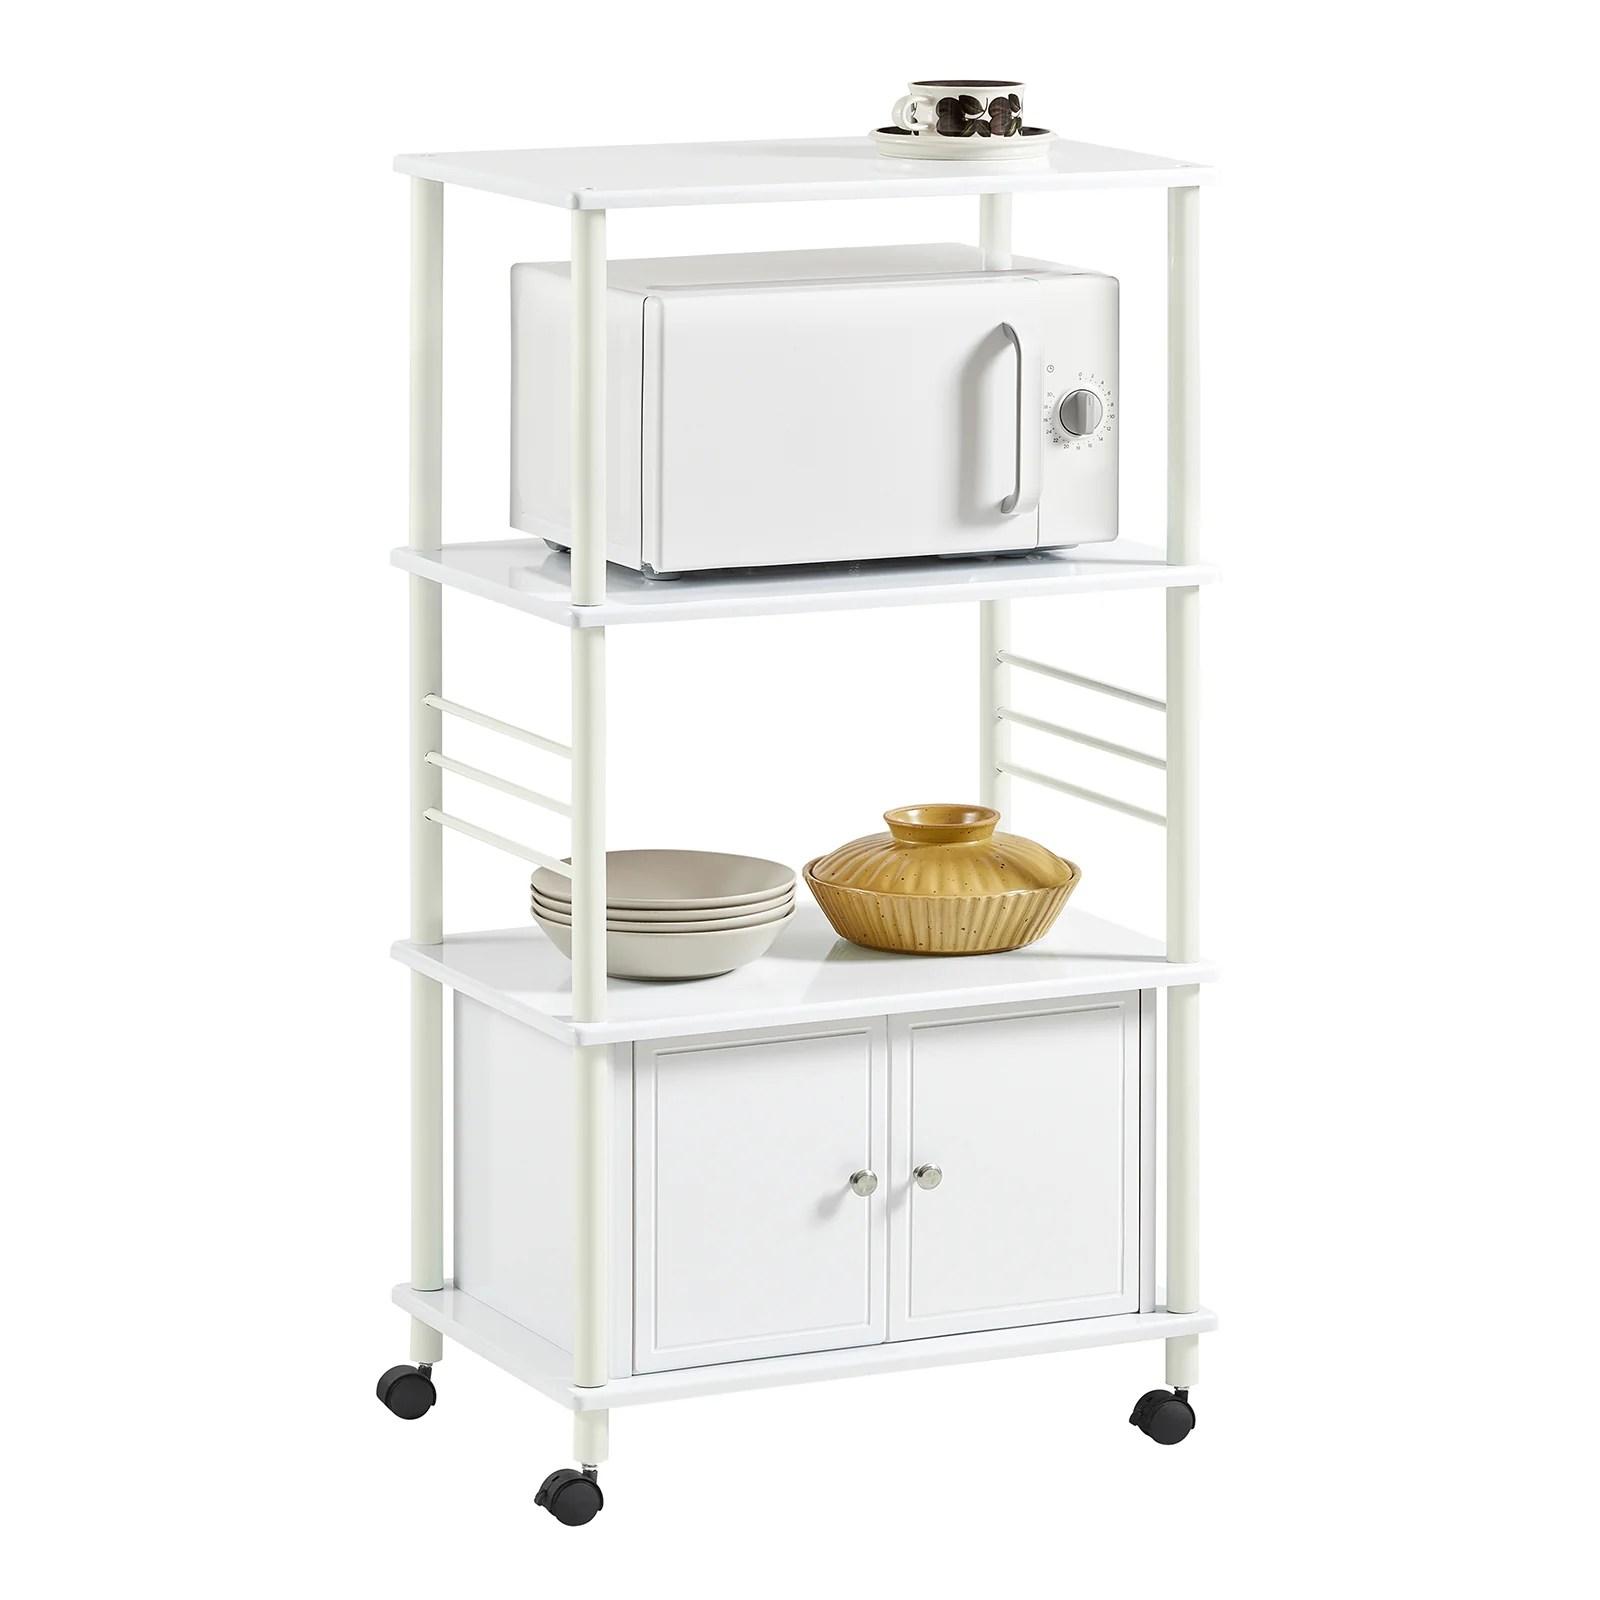 sobuy kitchen cabinet kitchen